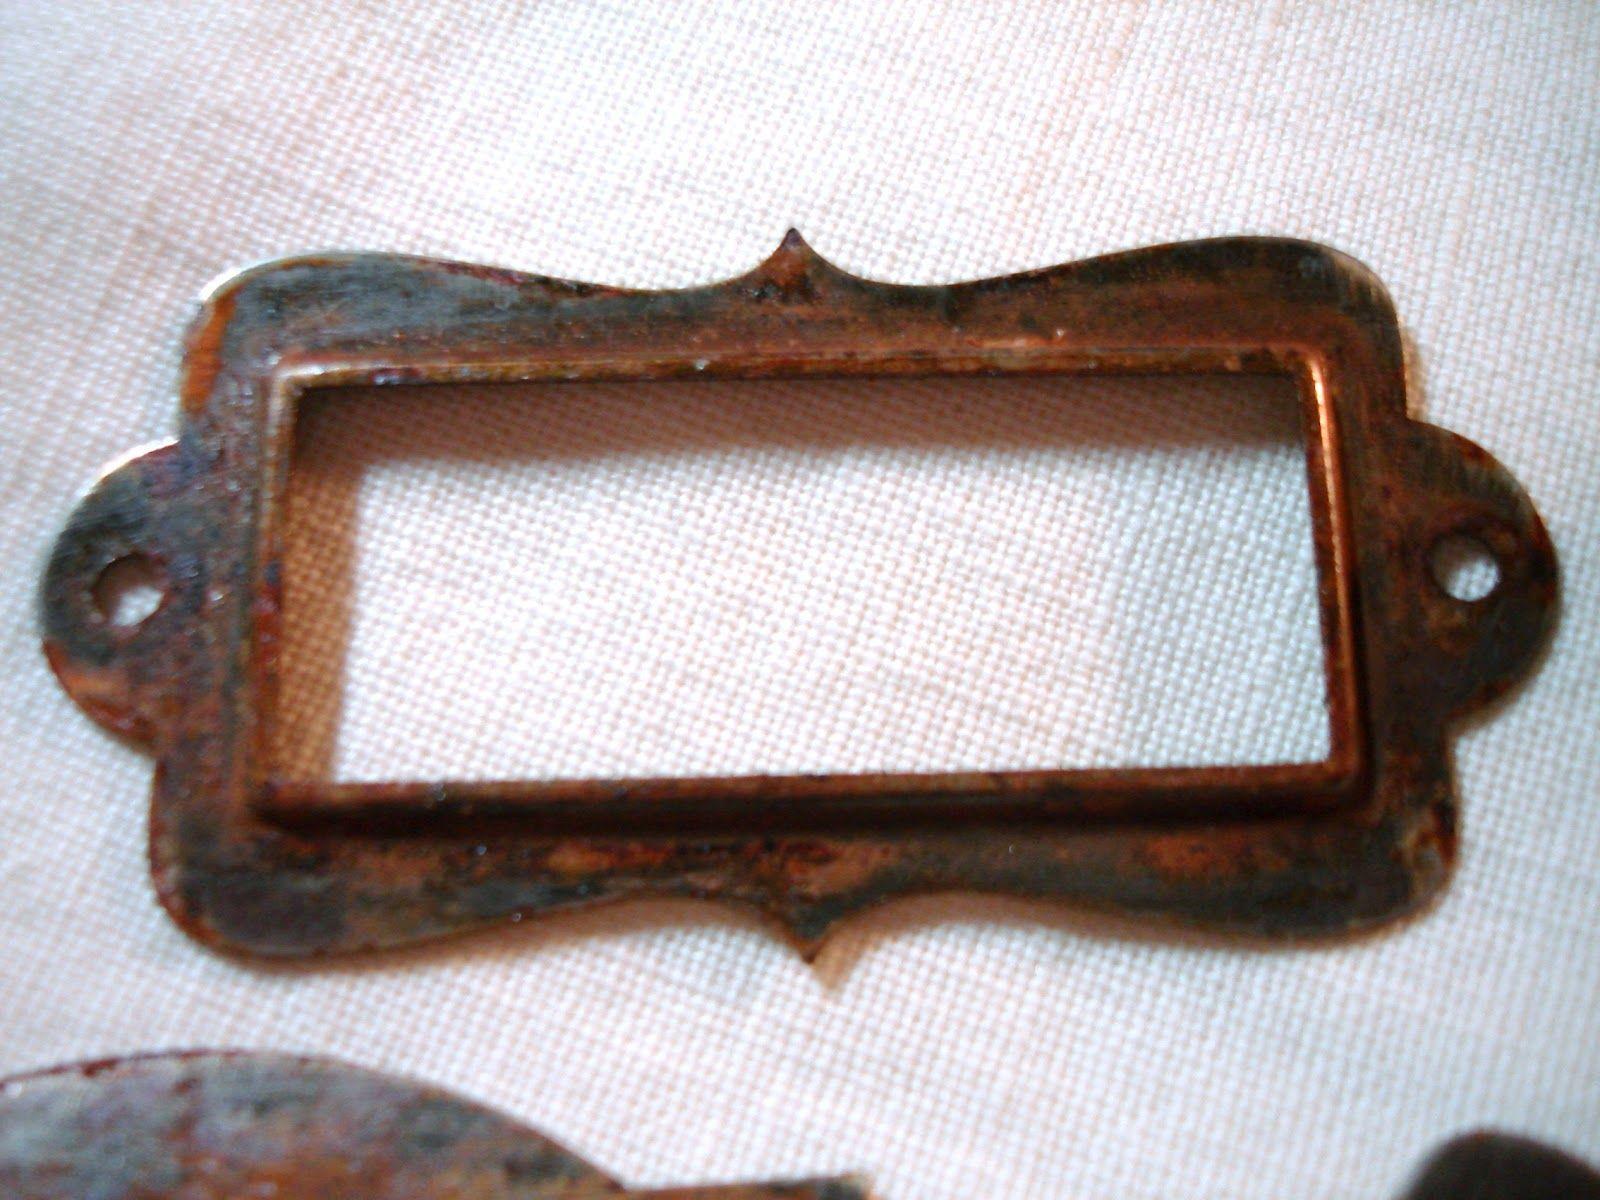 fast easy crusty rusty metal patina 1 4 c bleach 1 4 c vinegar soak overnight. Black Bedroom Furniture Sets. Home Design Ideas